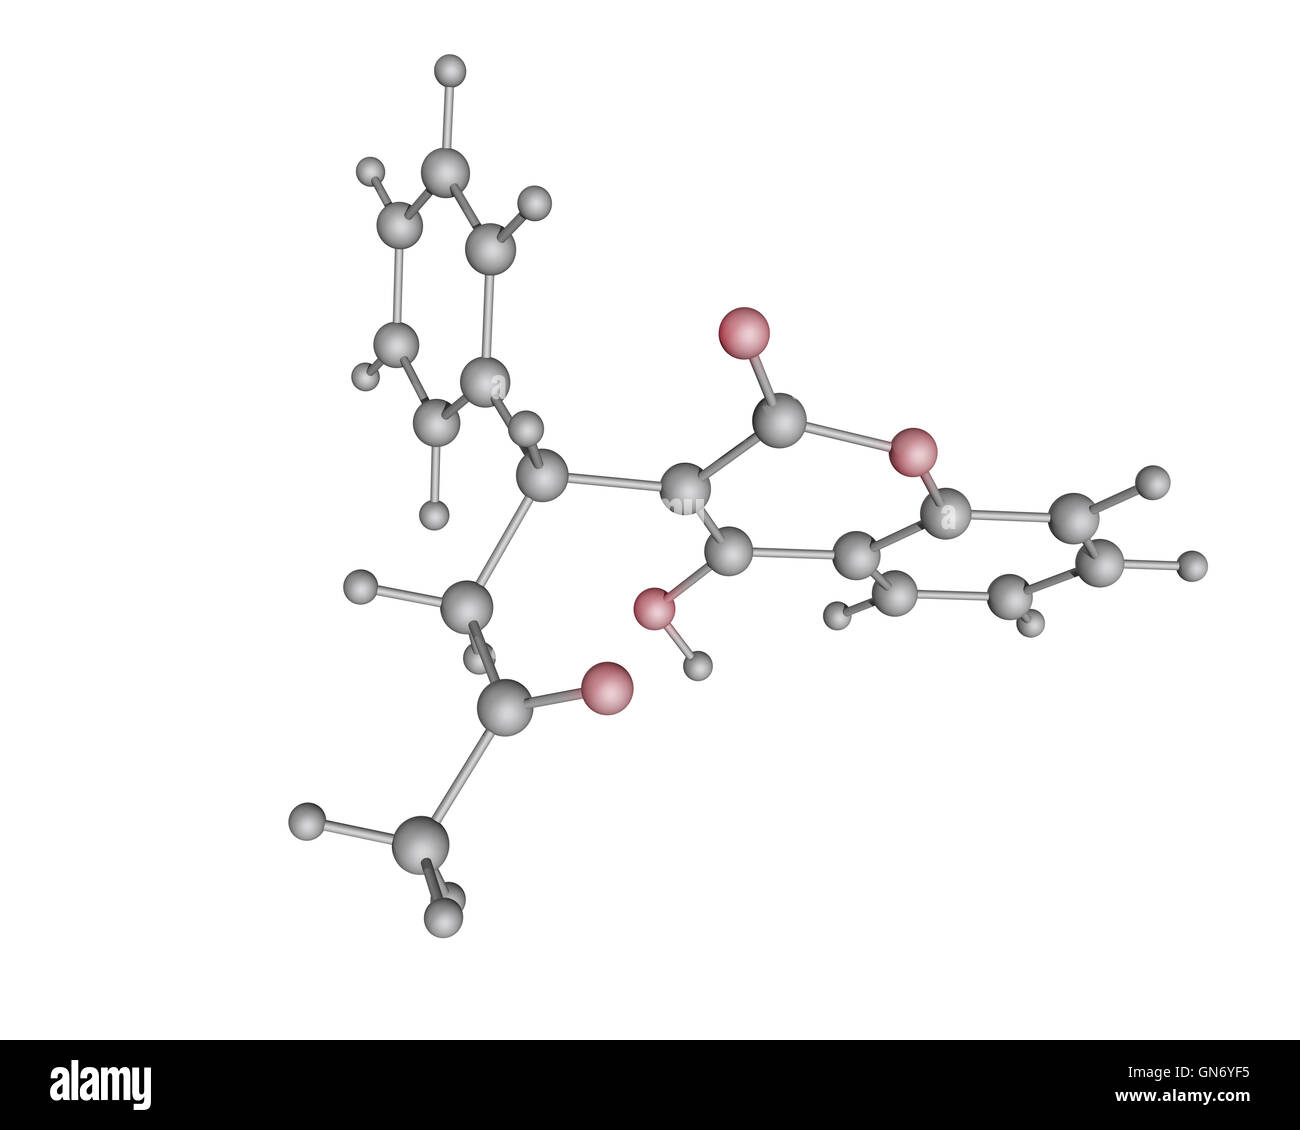 flexeril or tizanidine